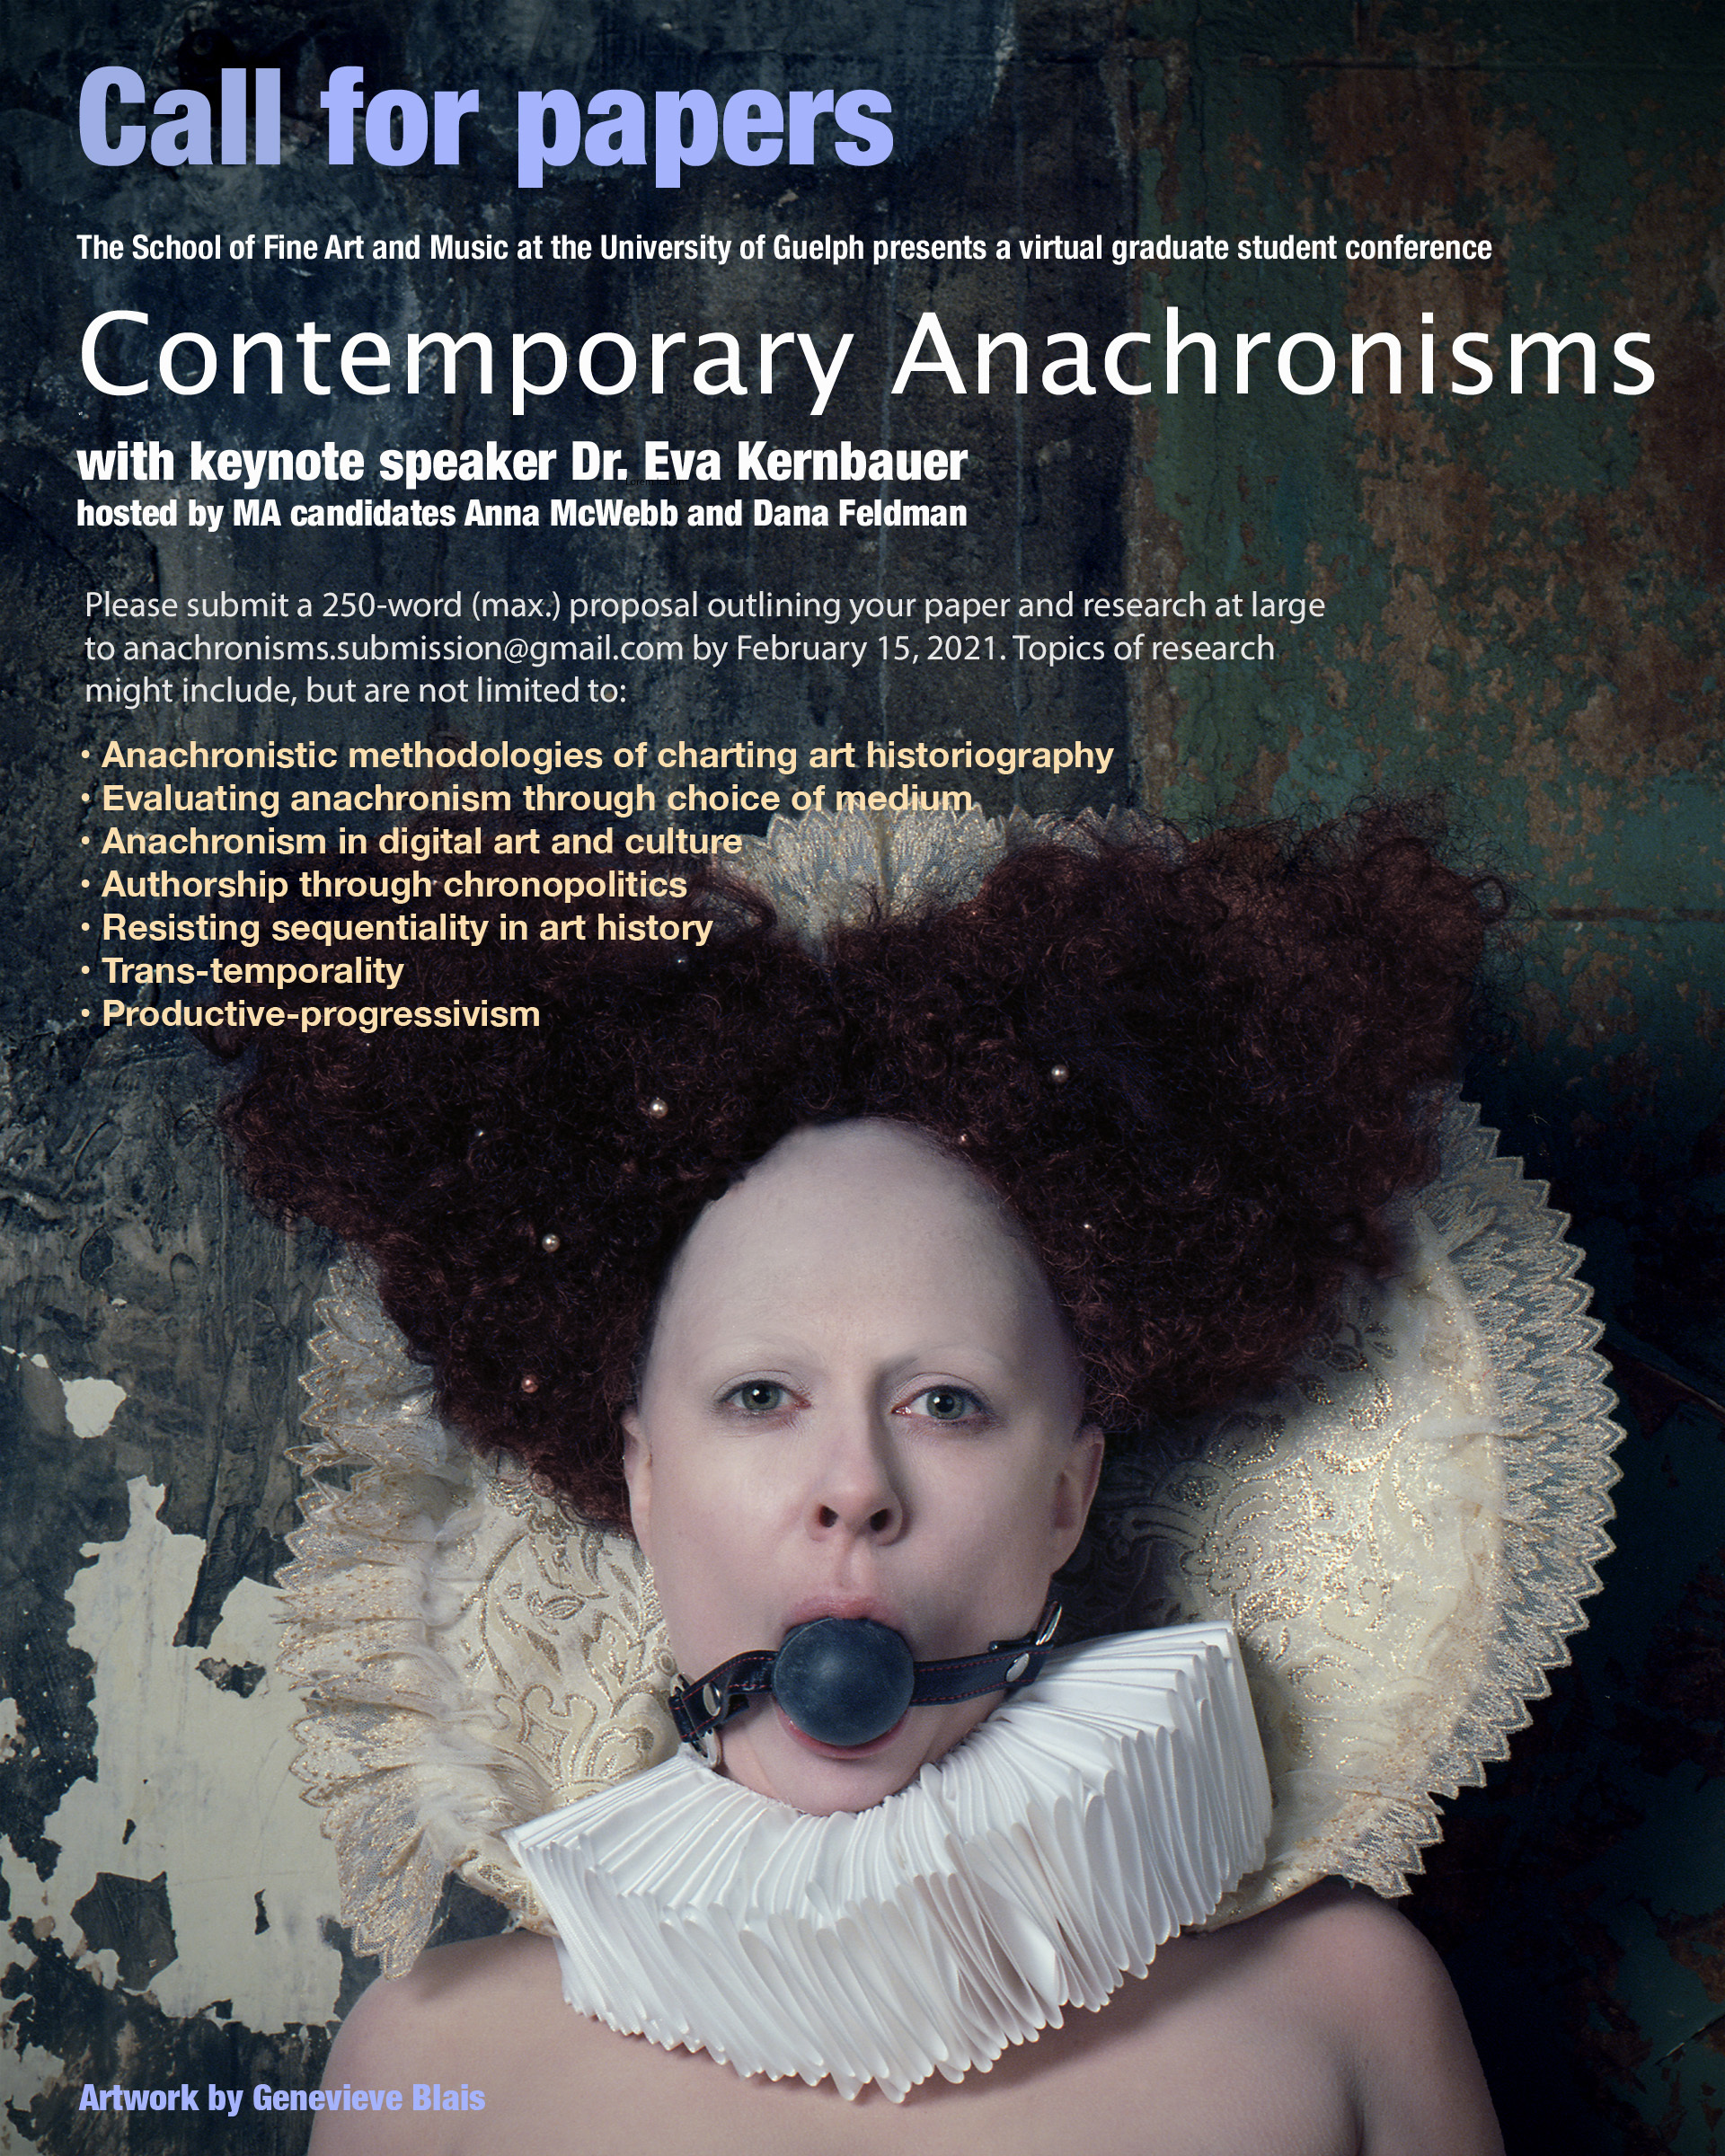 Contemporary Anachronisms cfpposter